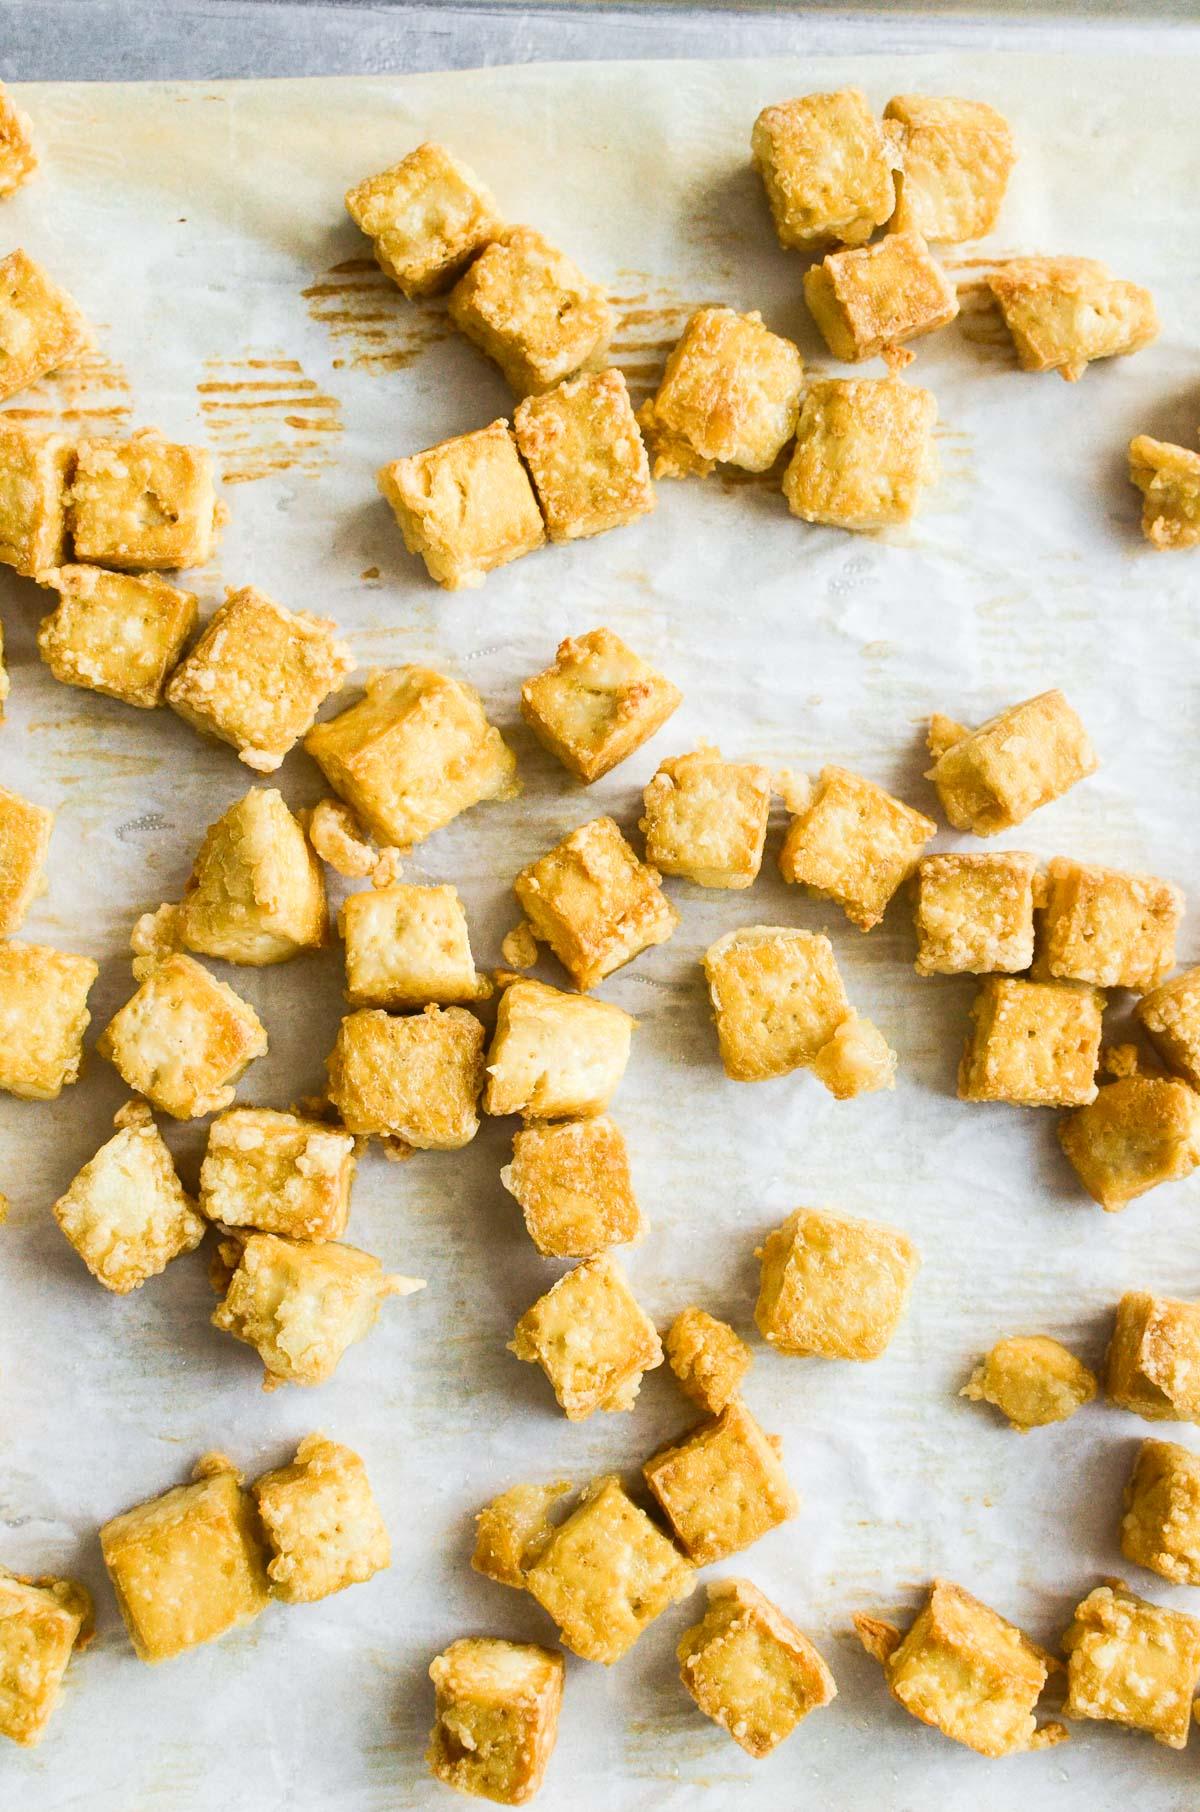 tofu cubes, baked